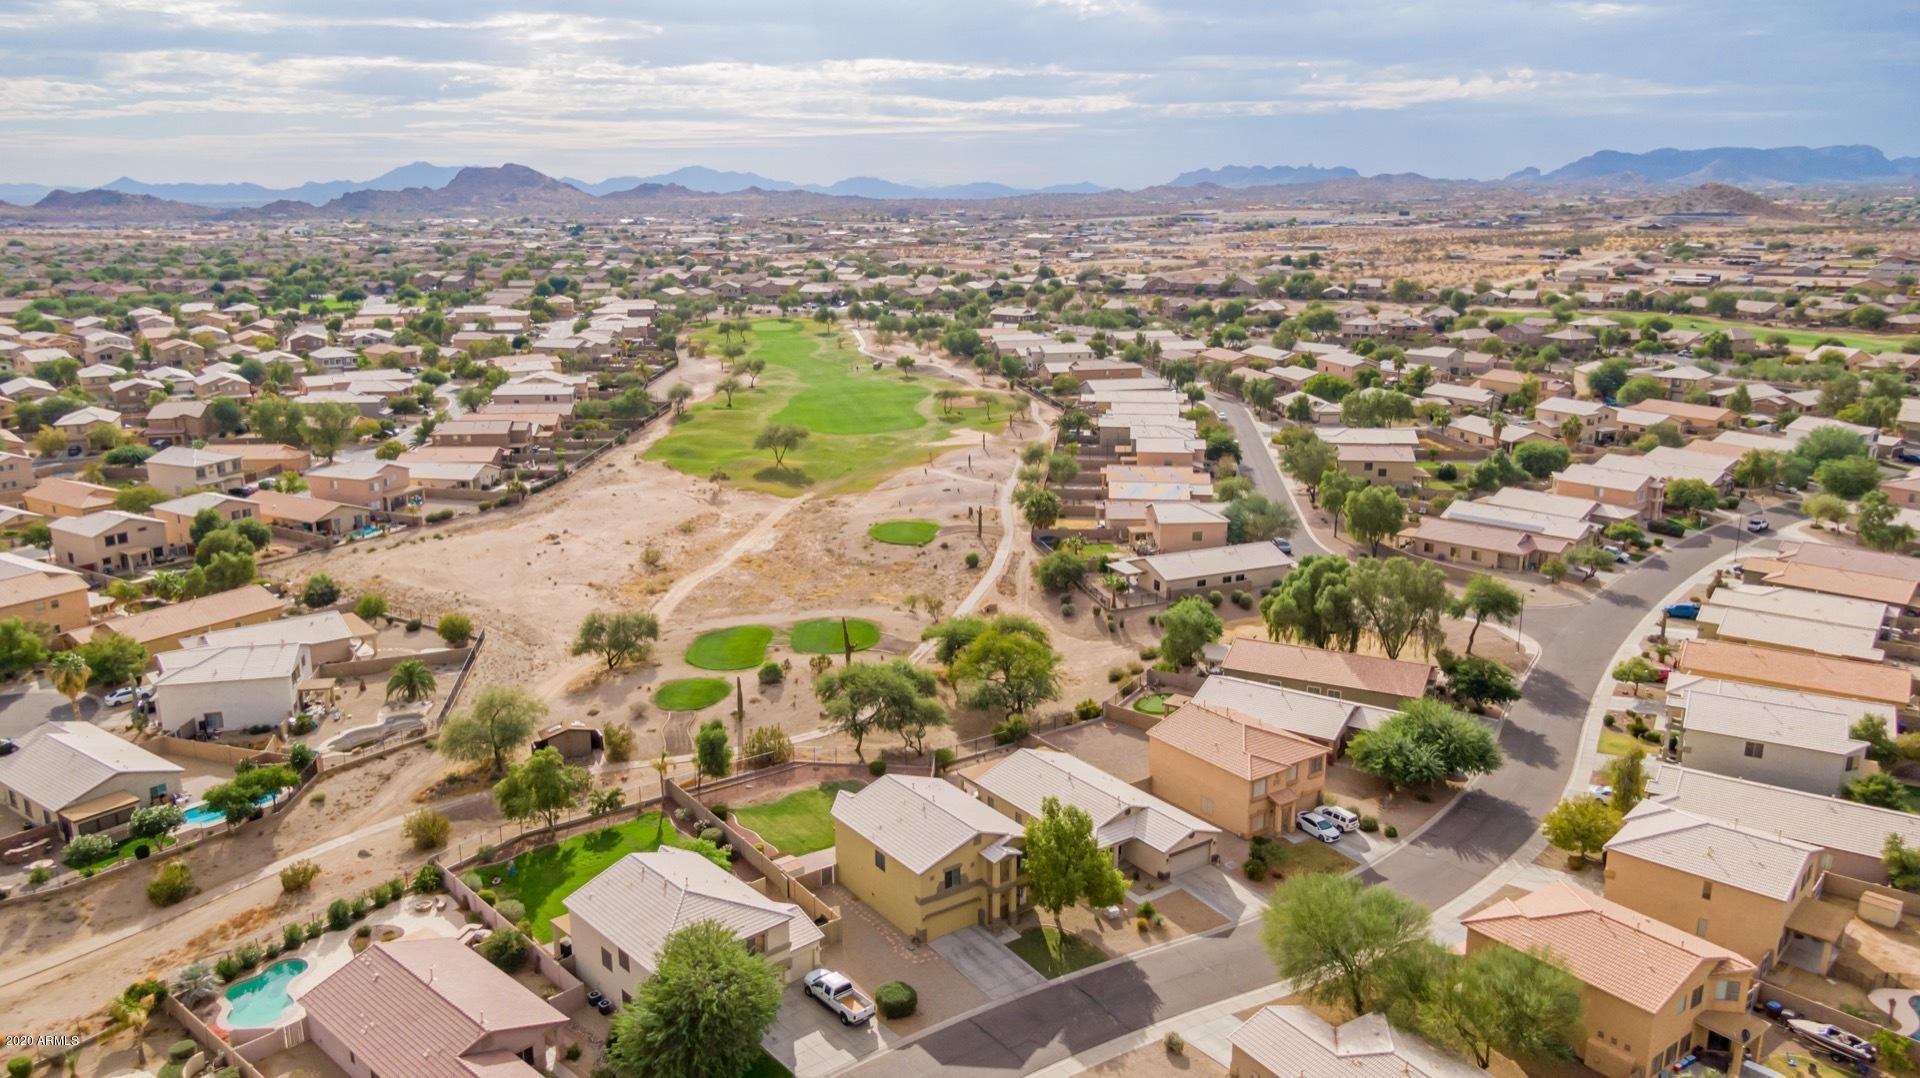 MLS 6156431 413 E SHAWNEE Road, San Tan Valley, AZ 85143 San Tan Valley AZ Johnson Ranch